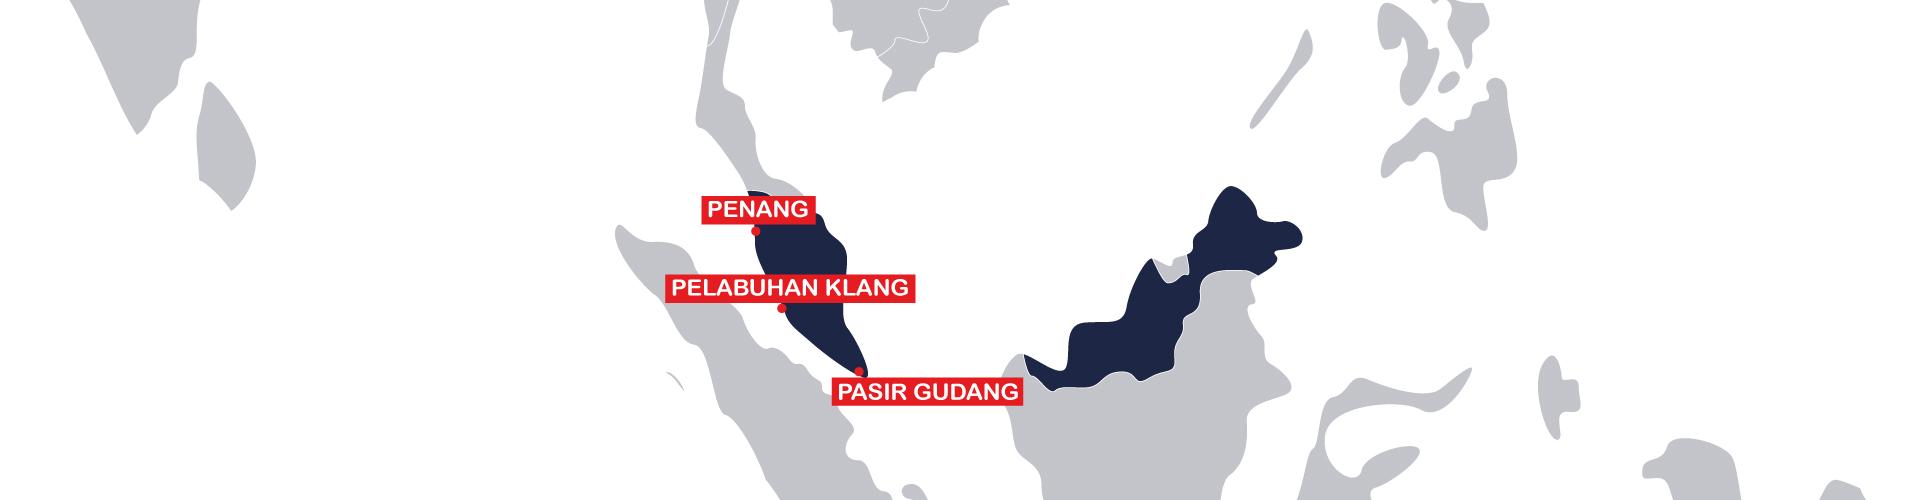 MAP MALAYSIA EN.jpg